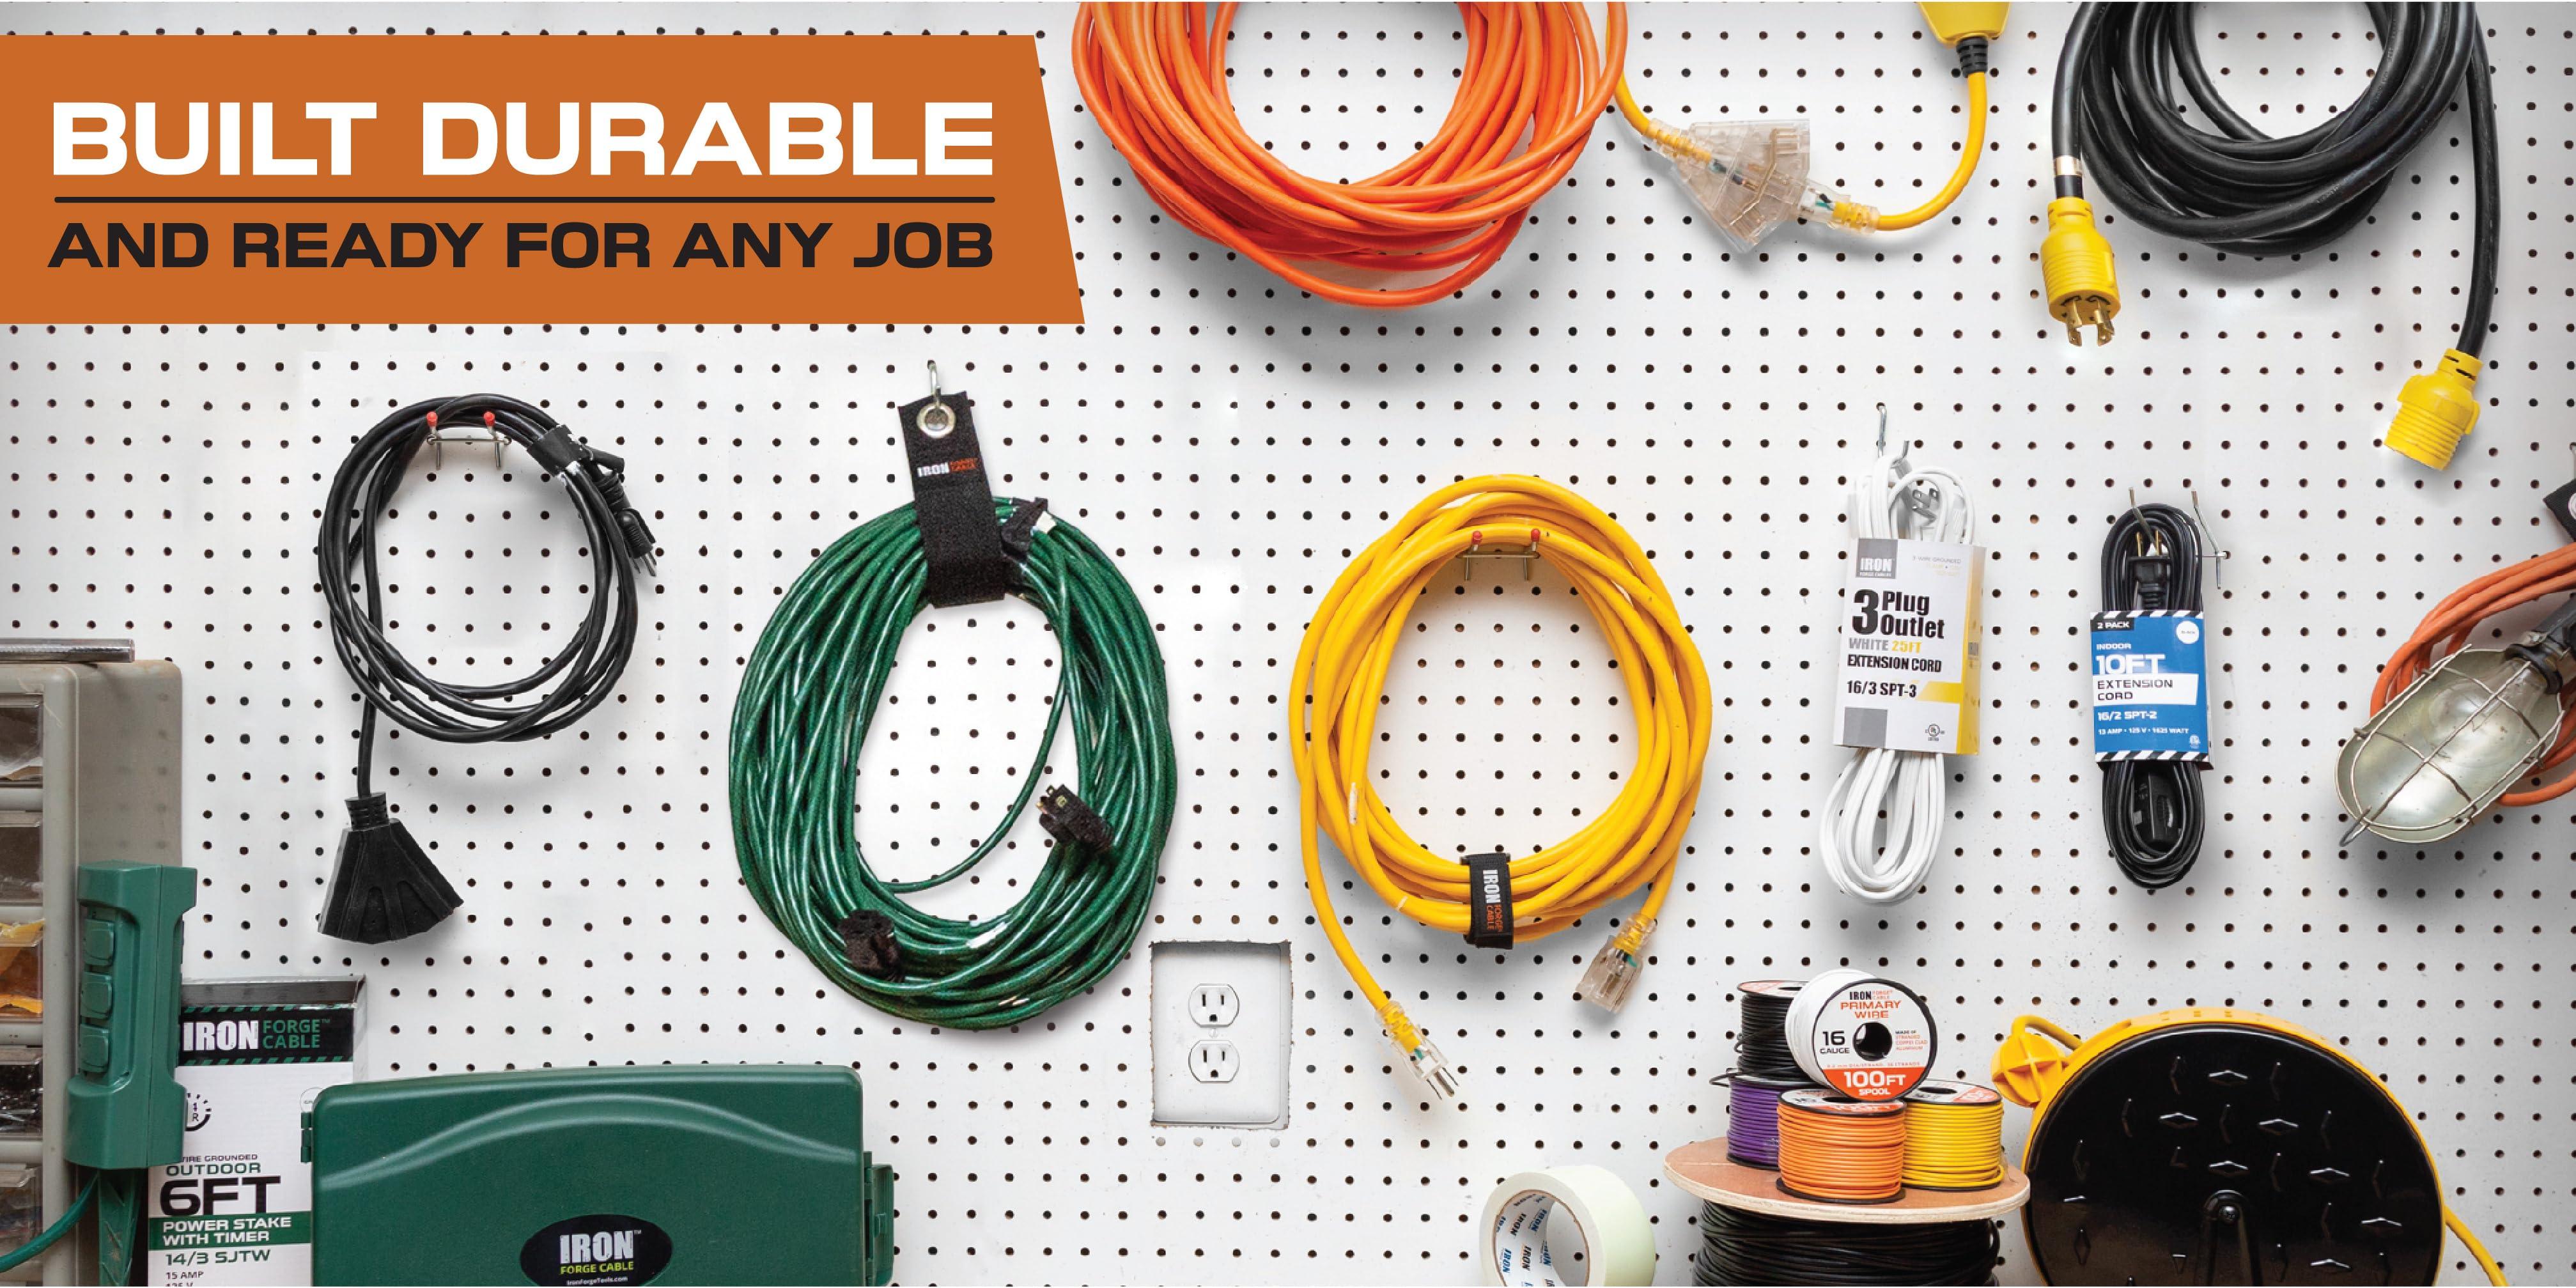 spt 3 wiring diagram wiring diagram dvd wiring diagram orange extension cord wiring diagram #14